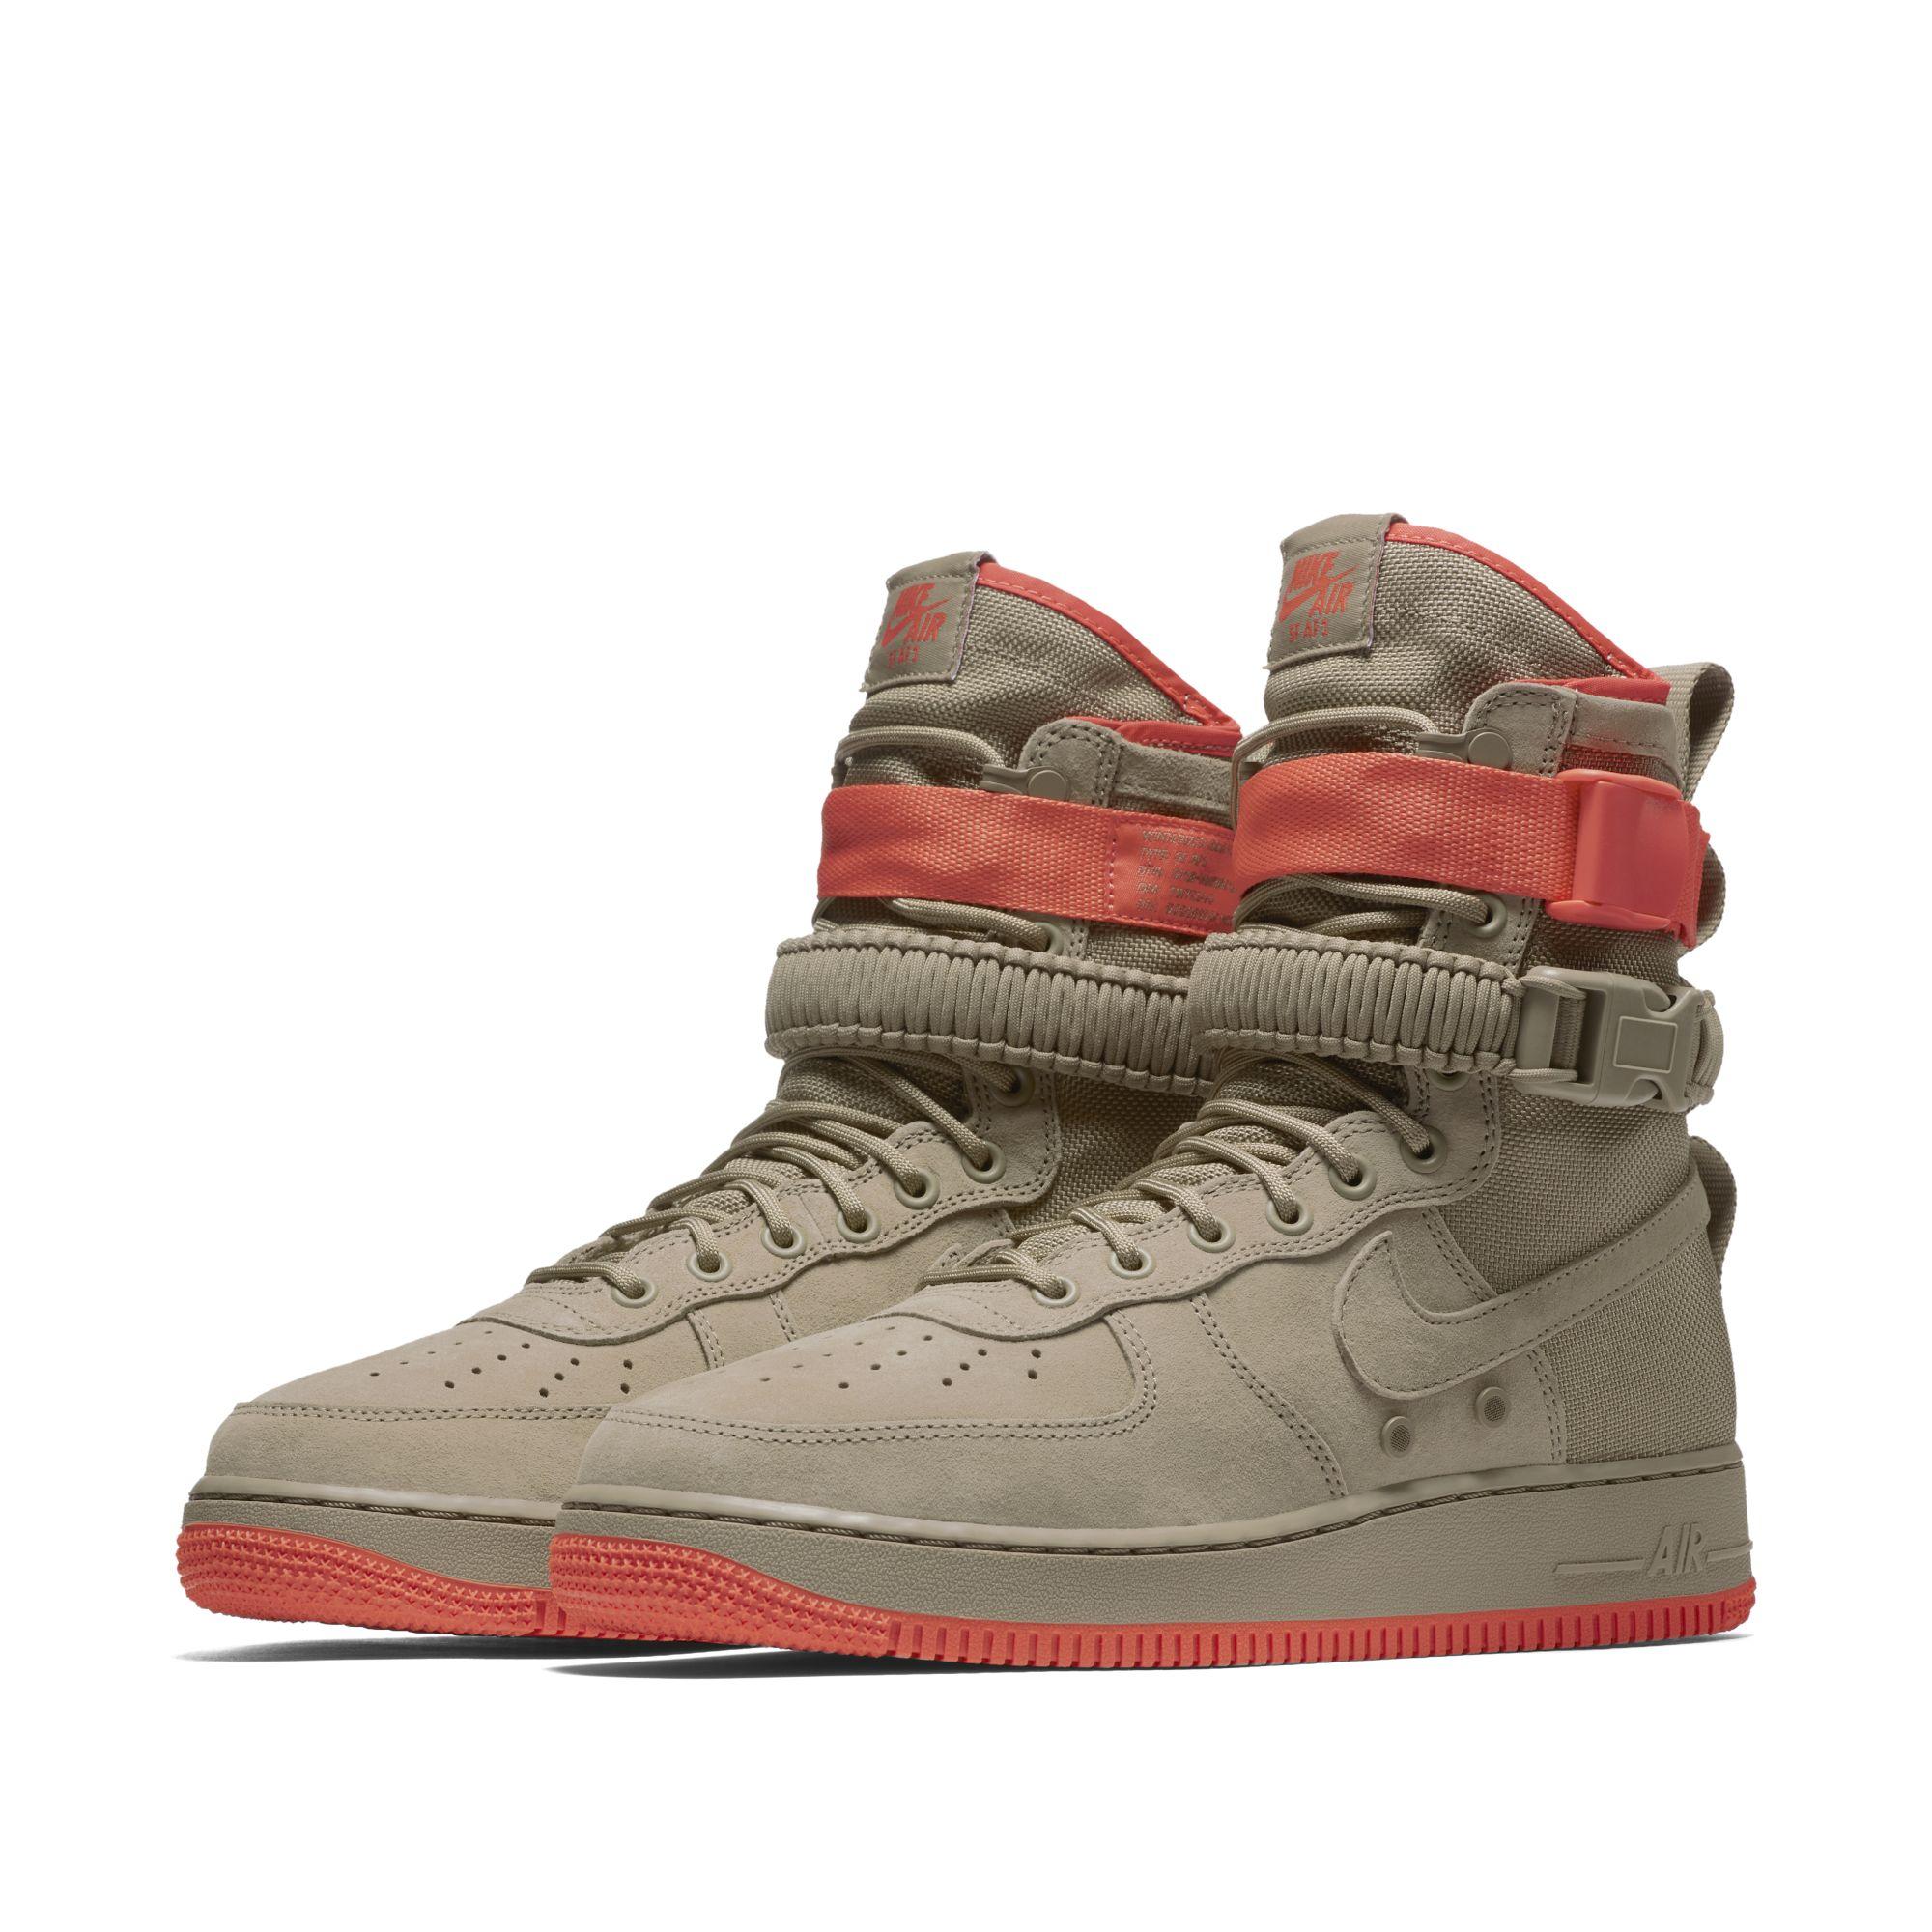 sports shoes 67891 fe368 nike sf af1 orange 1 · Kicks Off Court / Nike ...